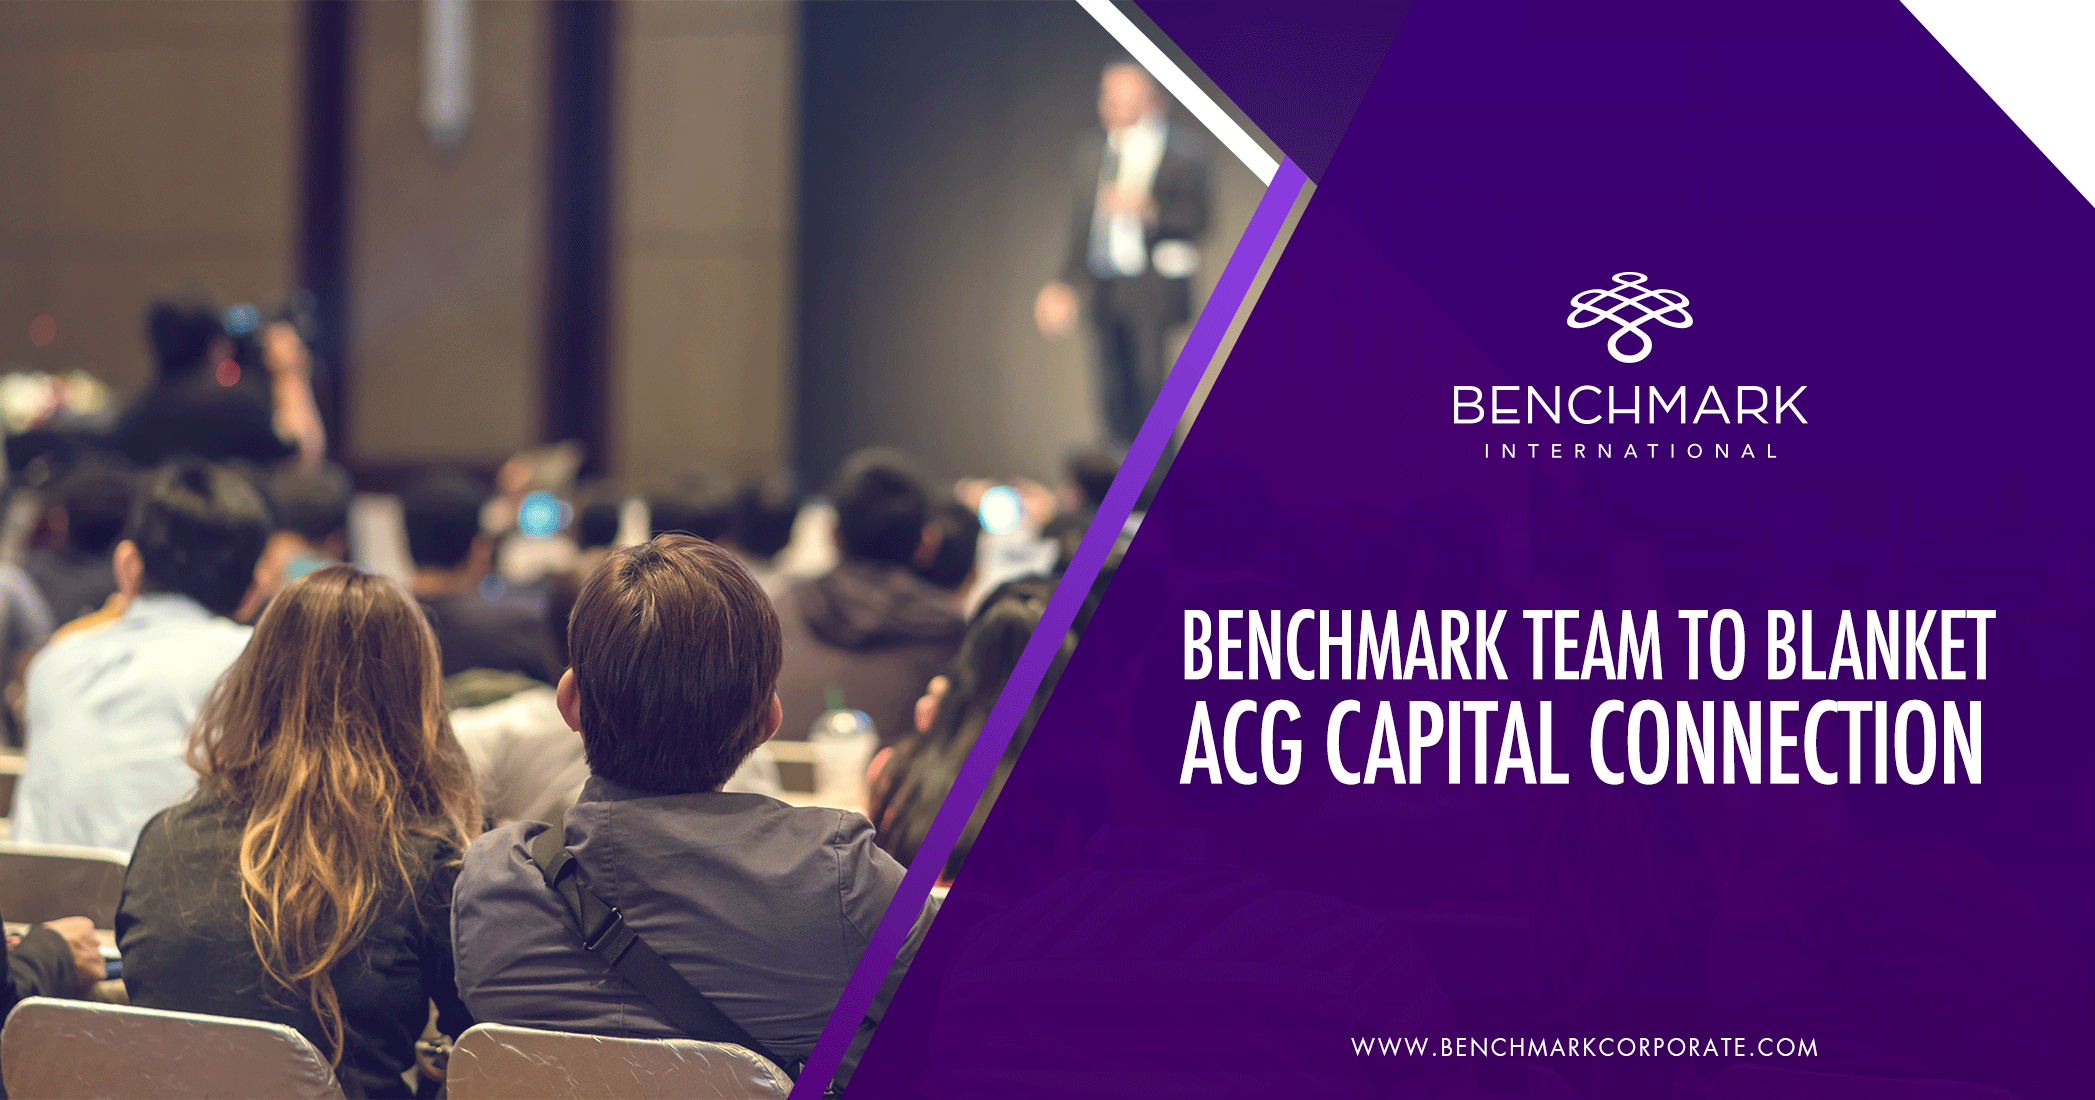 Benchmark International's Team to Blanket ACG Capital Connection